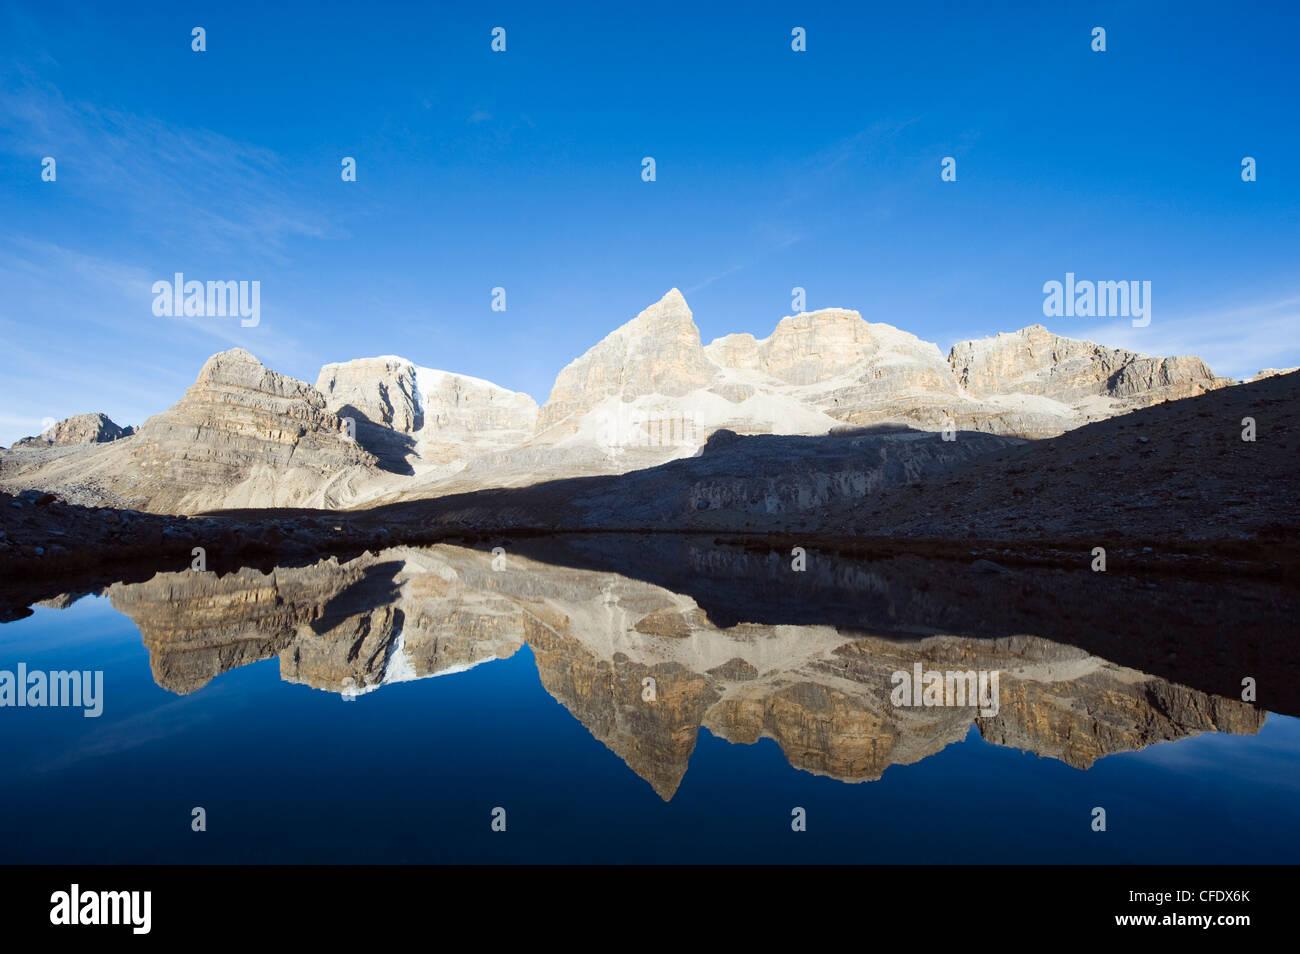 Reflection of mountains in Laguna de la Plaza, El Cocuy National Park, Colombia, South America - Stock Image